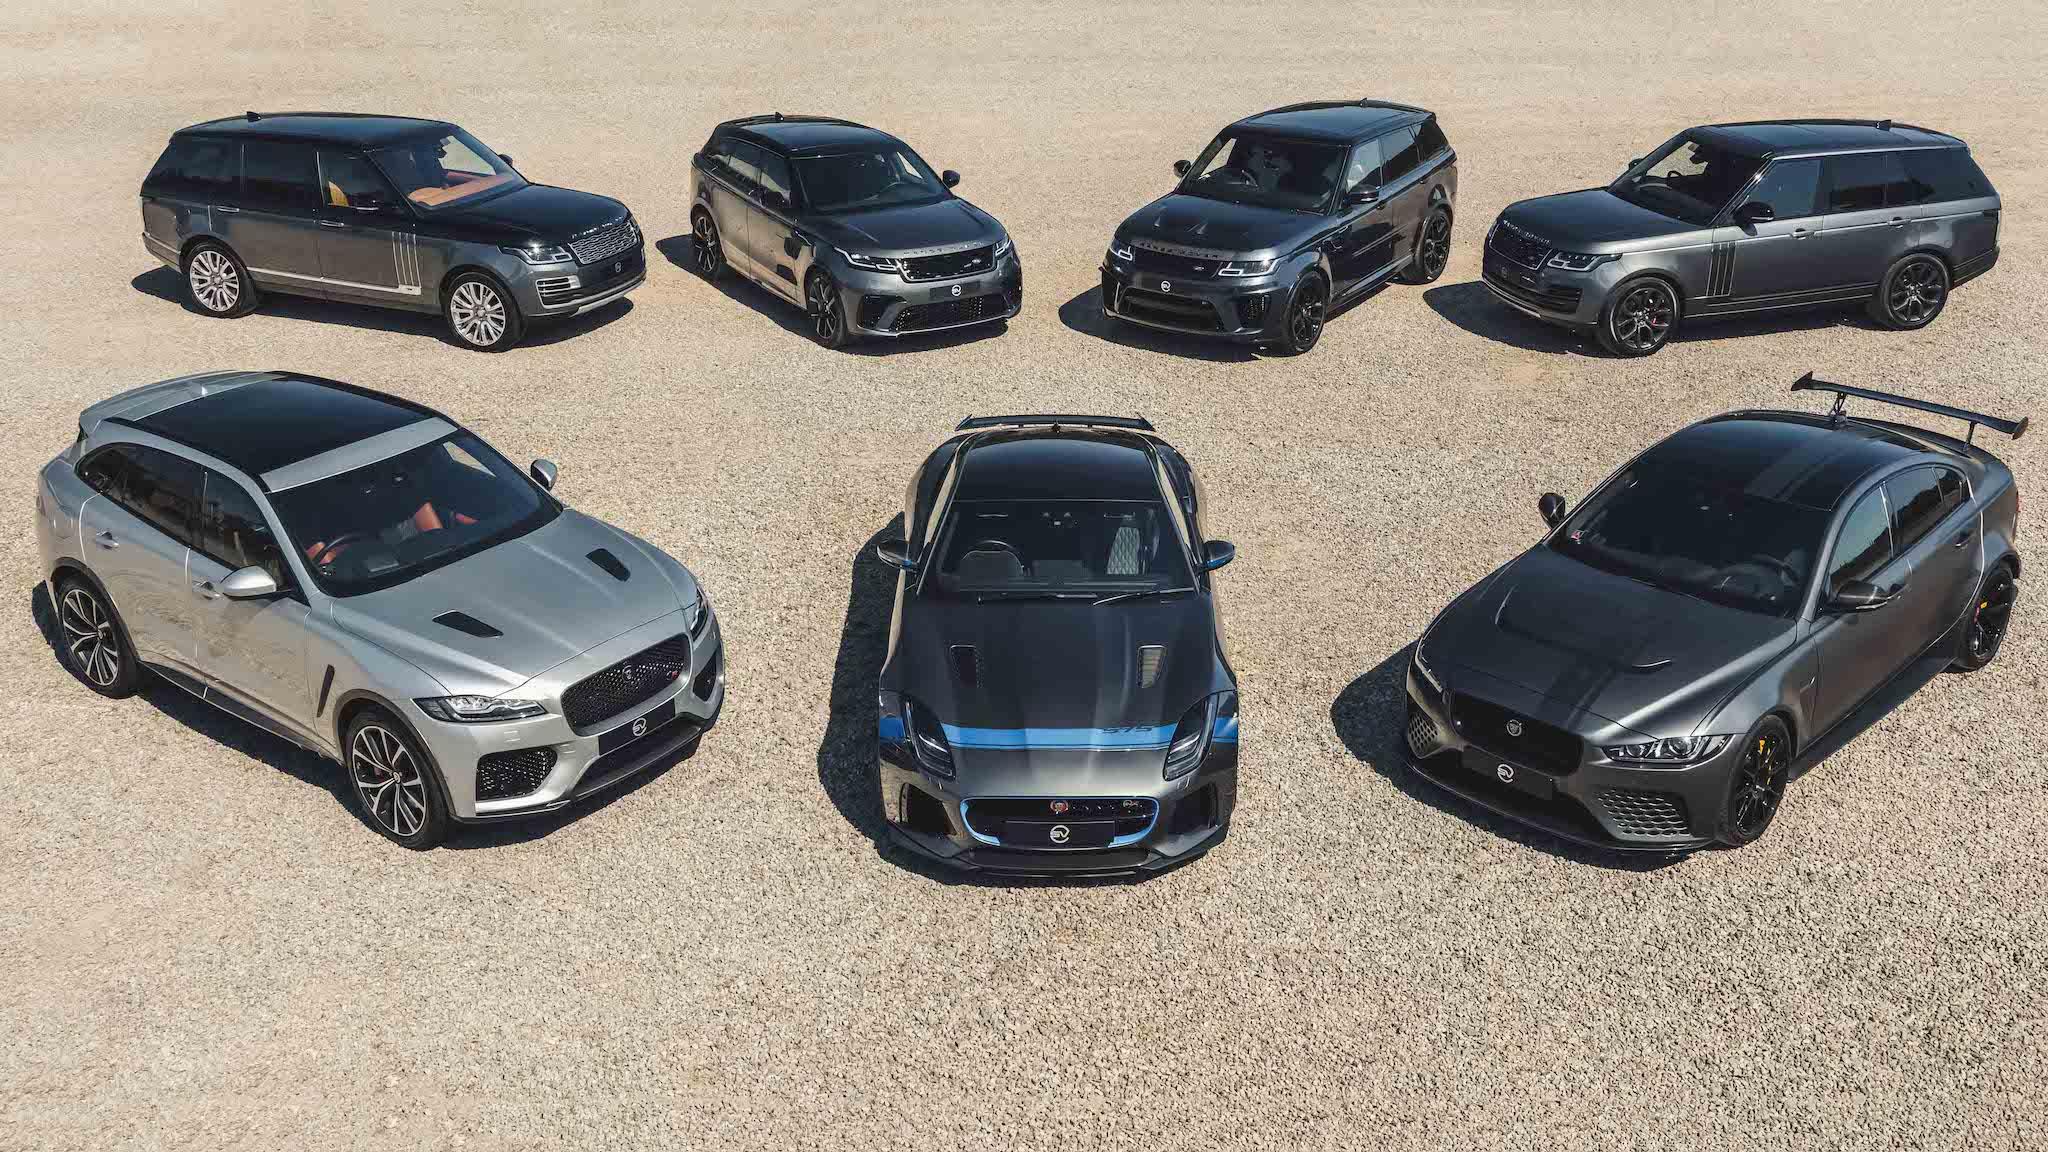 逆風高飛!Jaguar Land Rover SVO 頂級特製車越賣越好